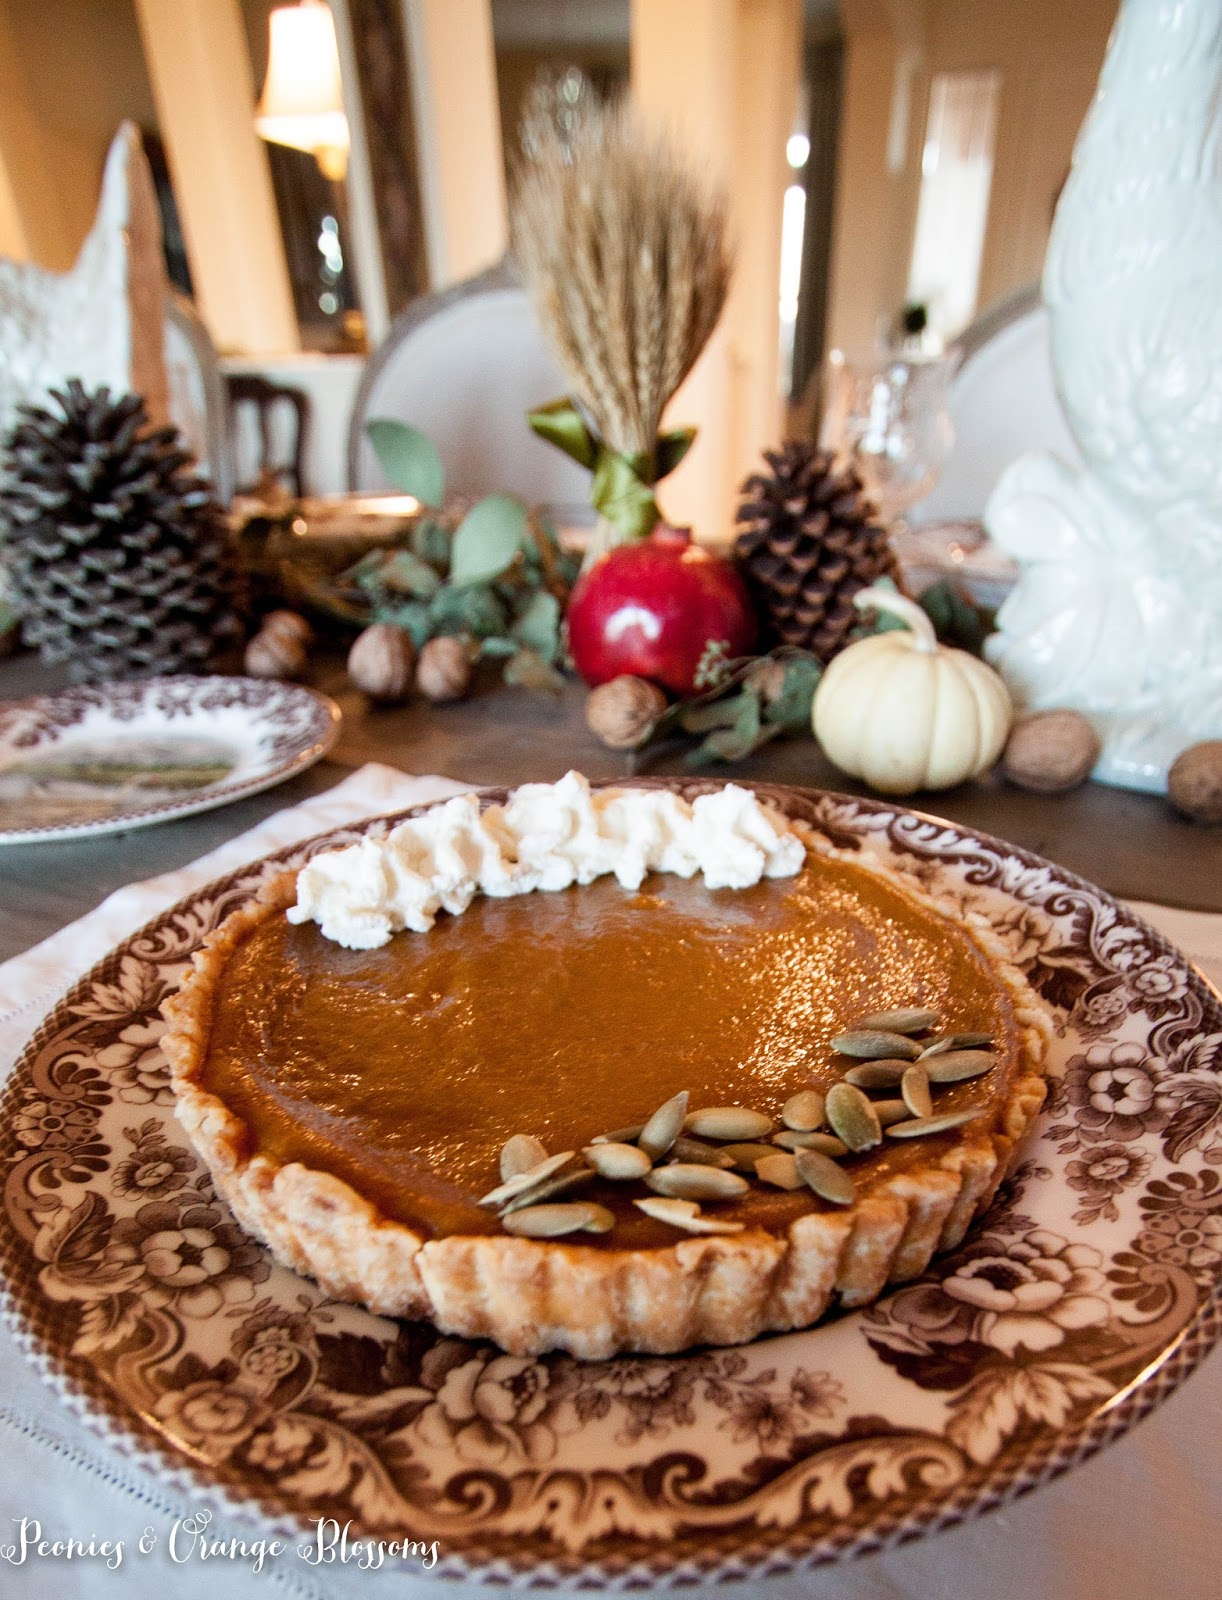 A delicious pumpkin tart recipe